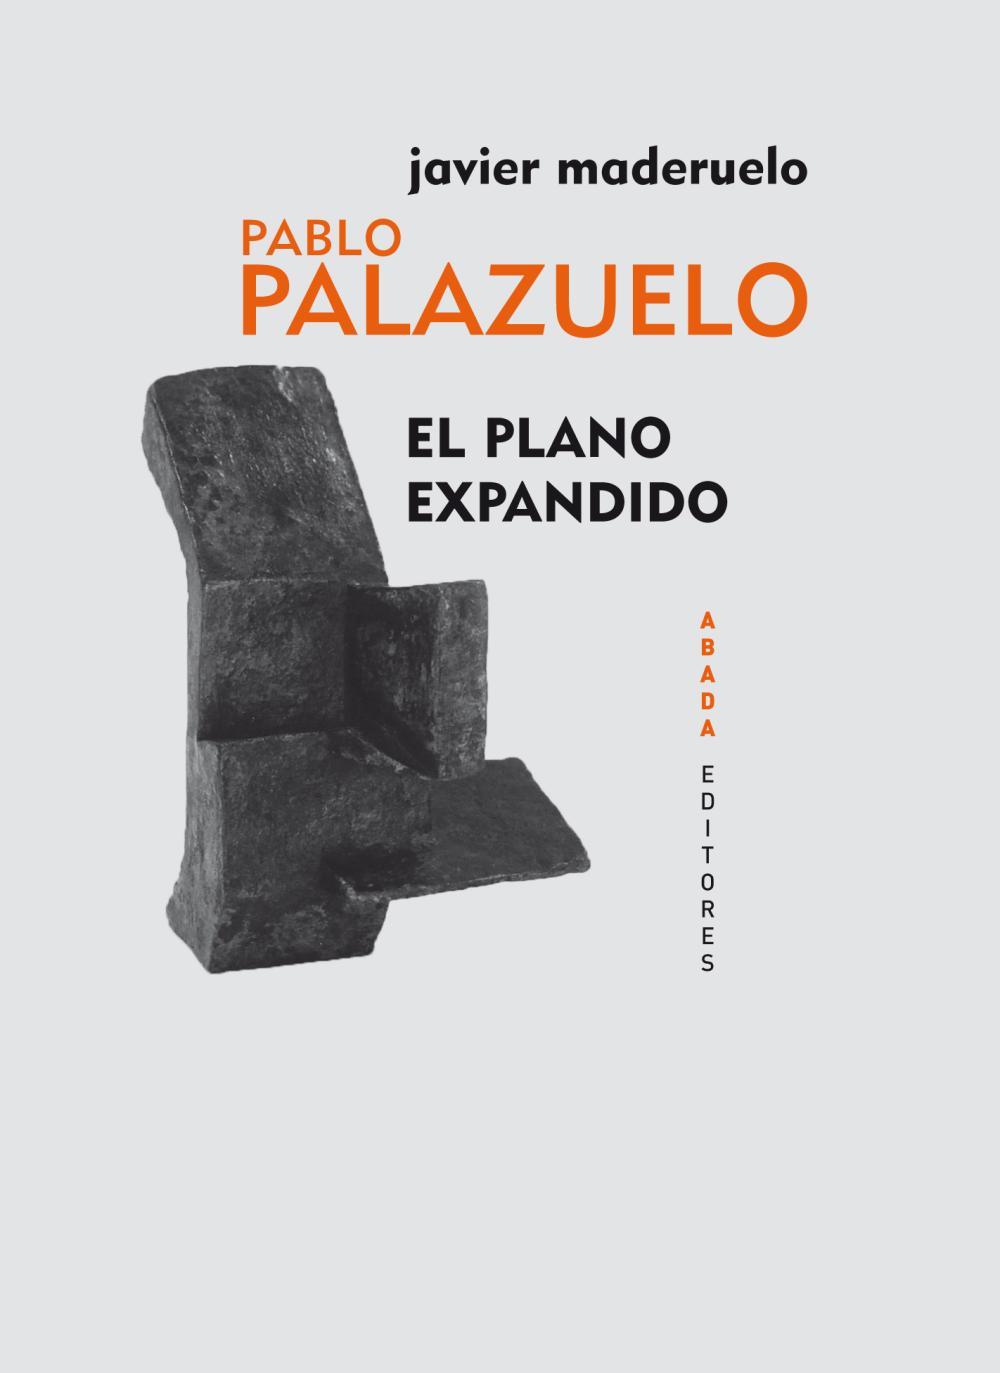 Pablo Palazuelo